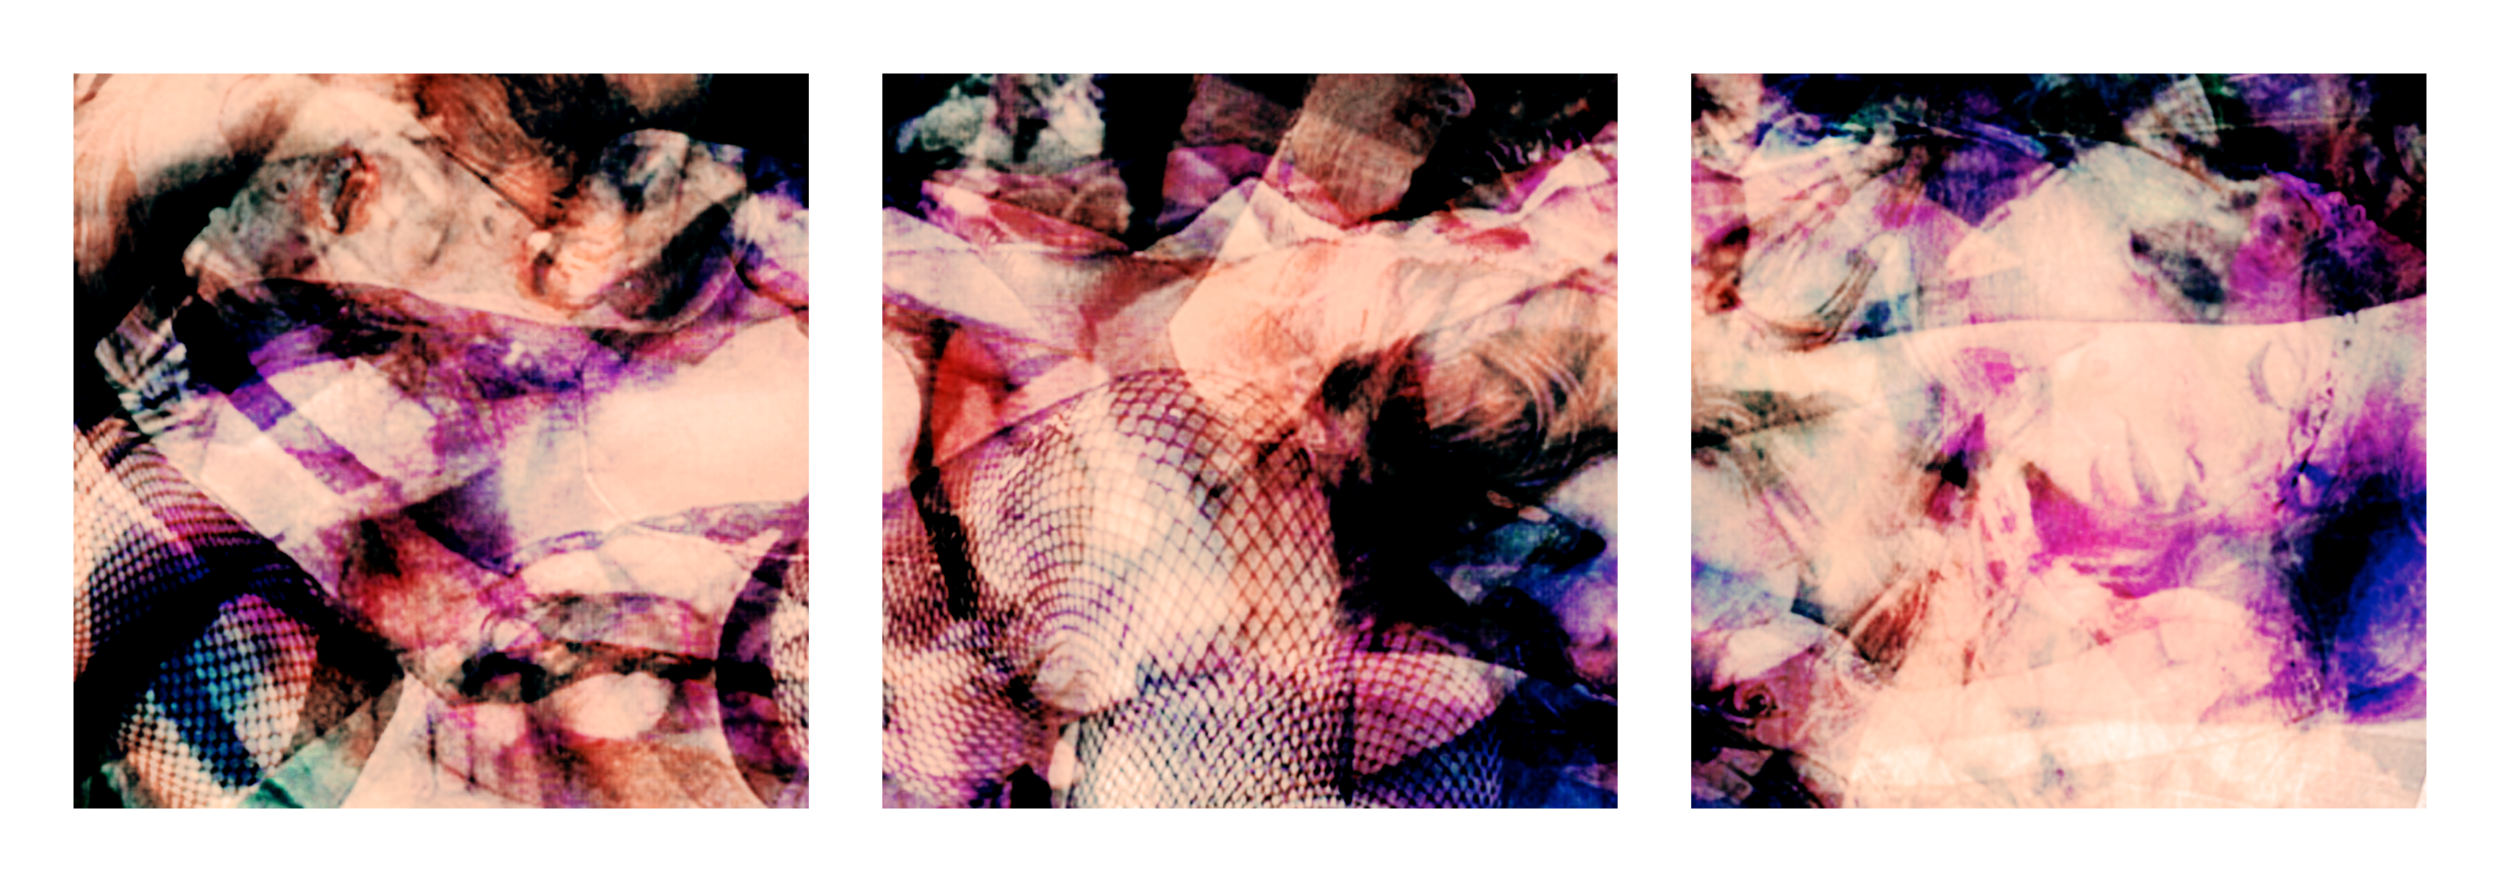 Overdose 18.1-3 (Triptych), 2008